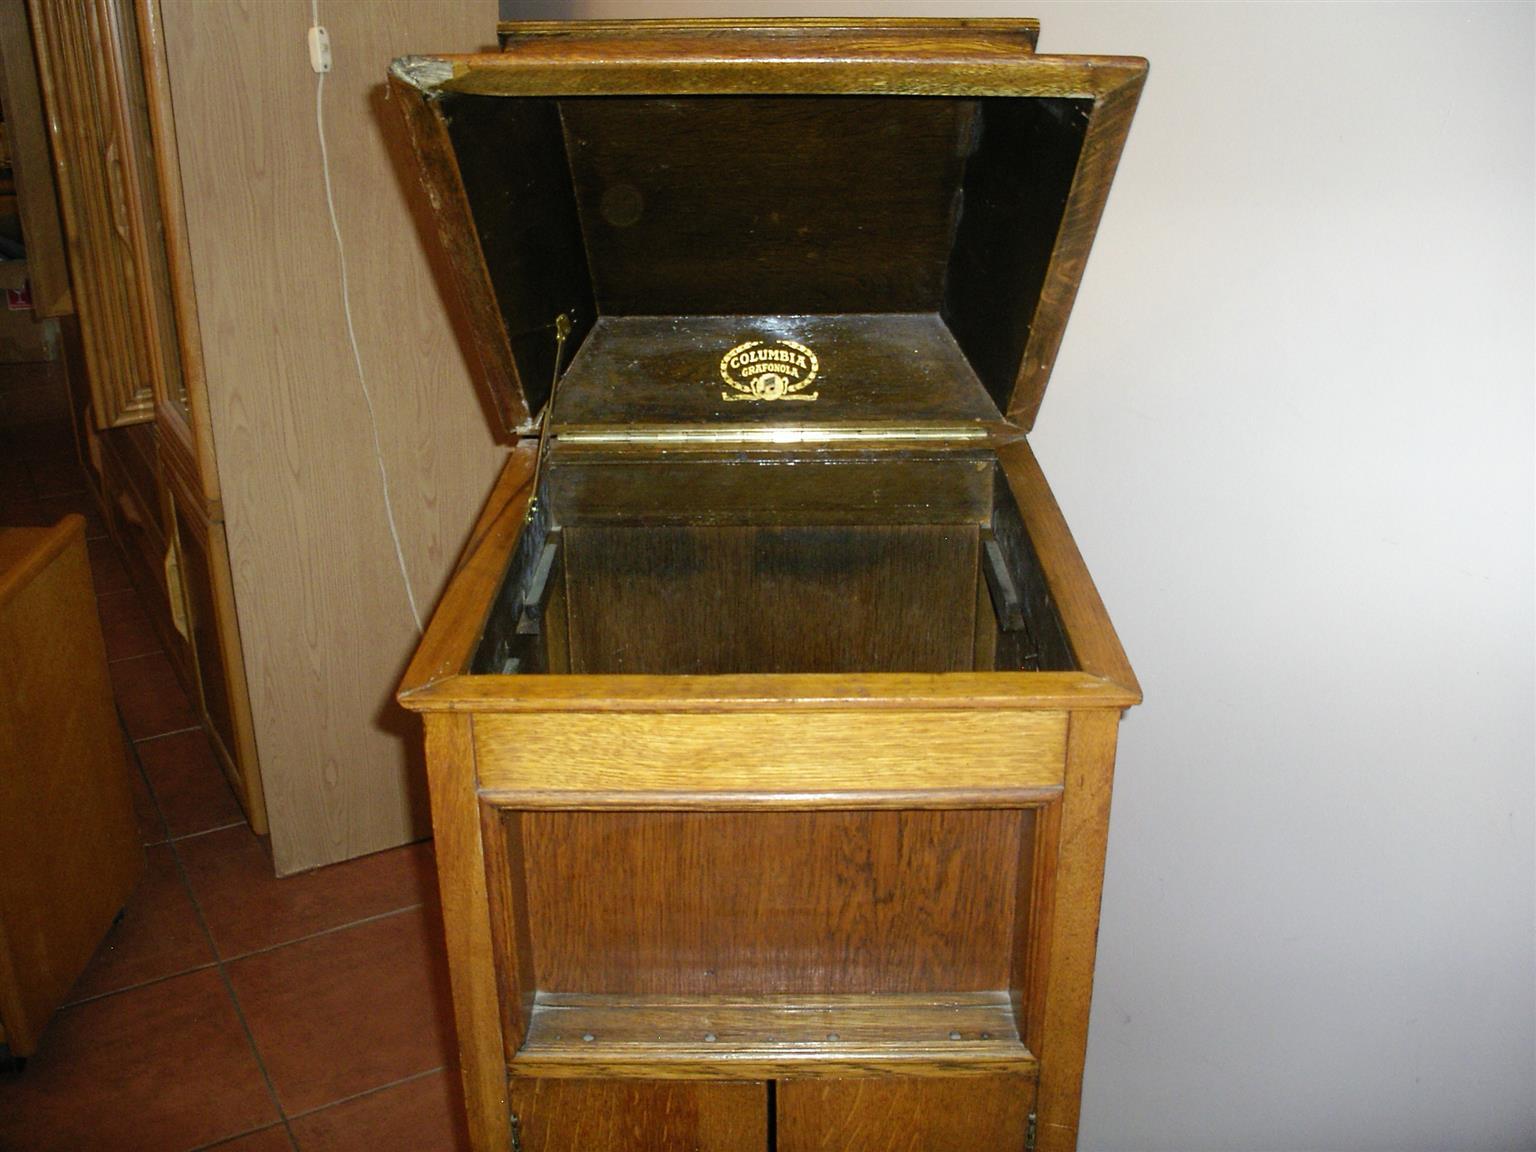 Vintage Original Columbia Grafonla Cabinet